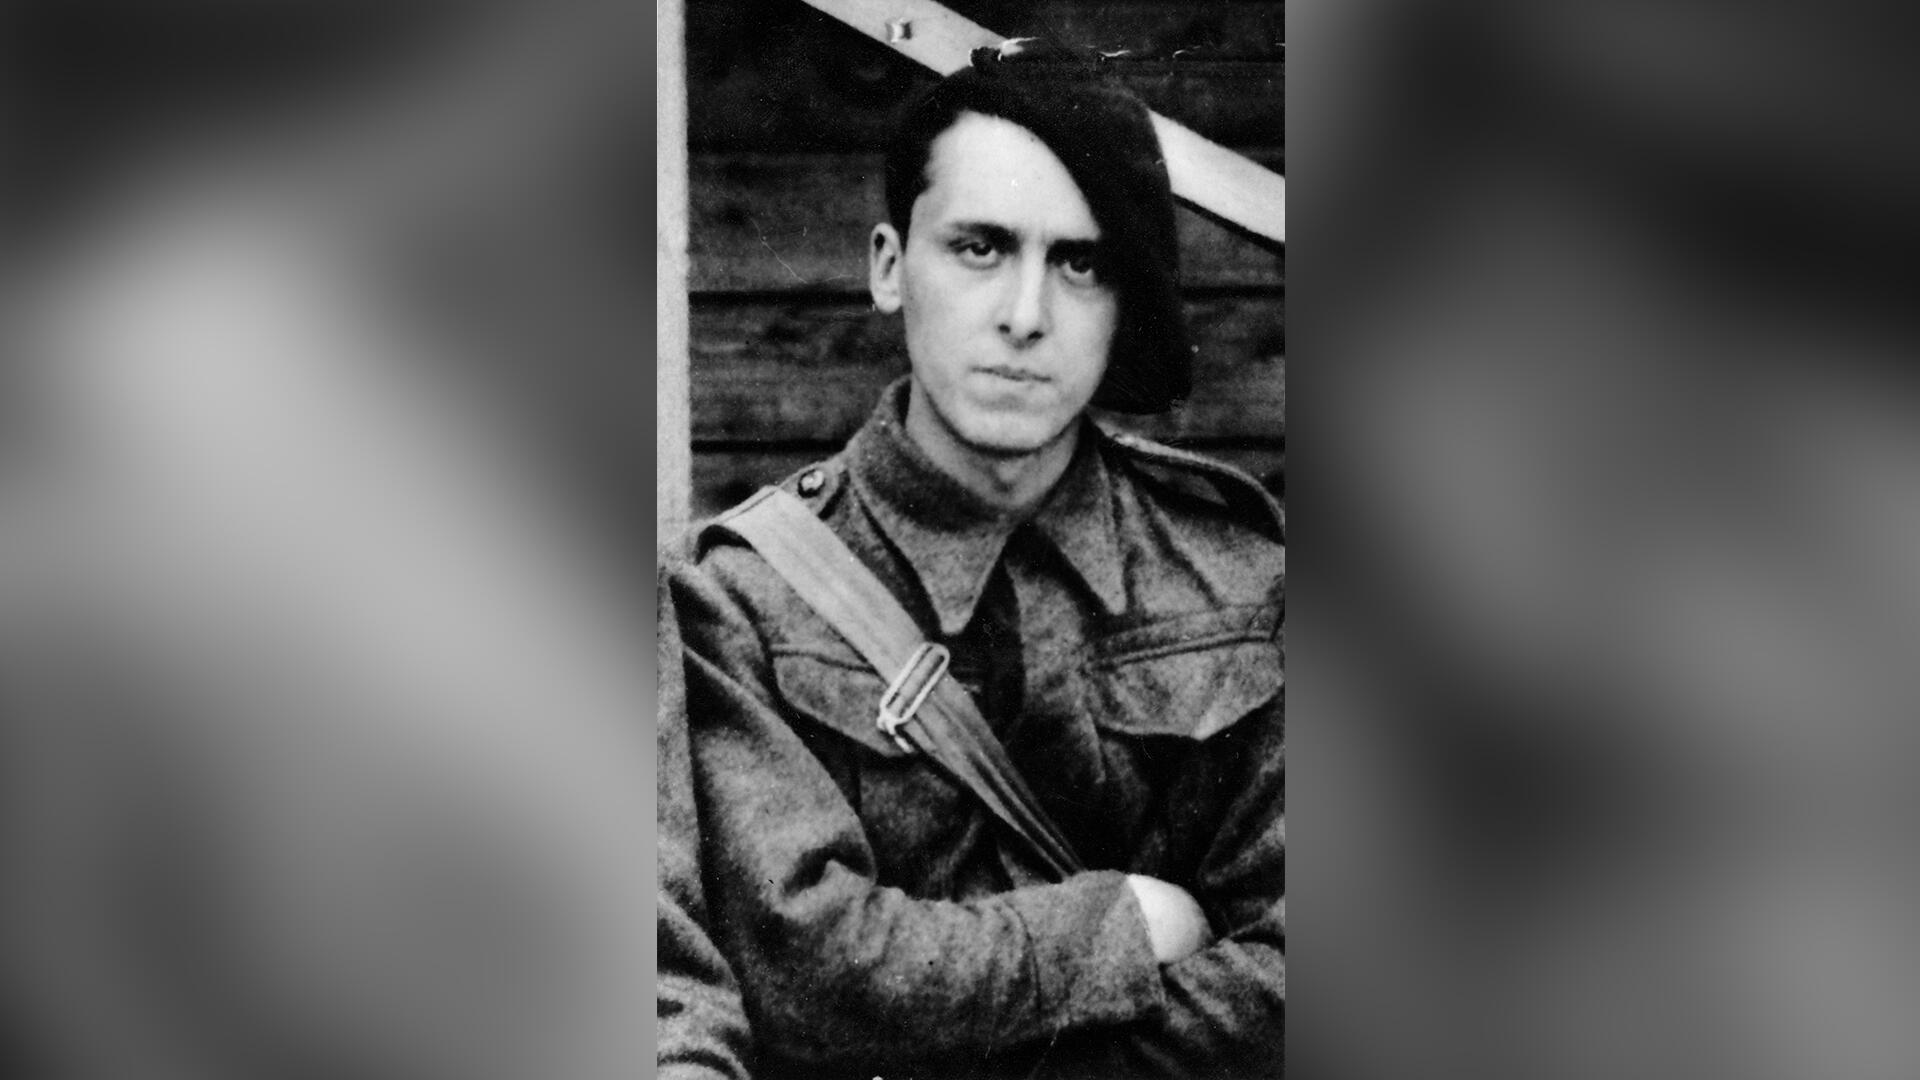 Daniel Cordier in Delville Camp (England) in July 1940.